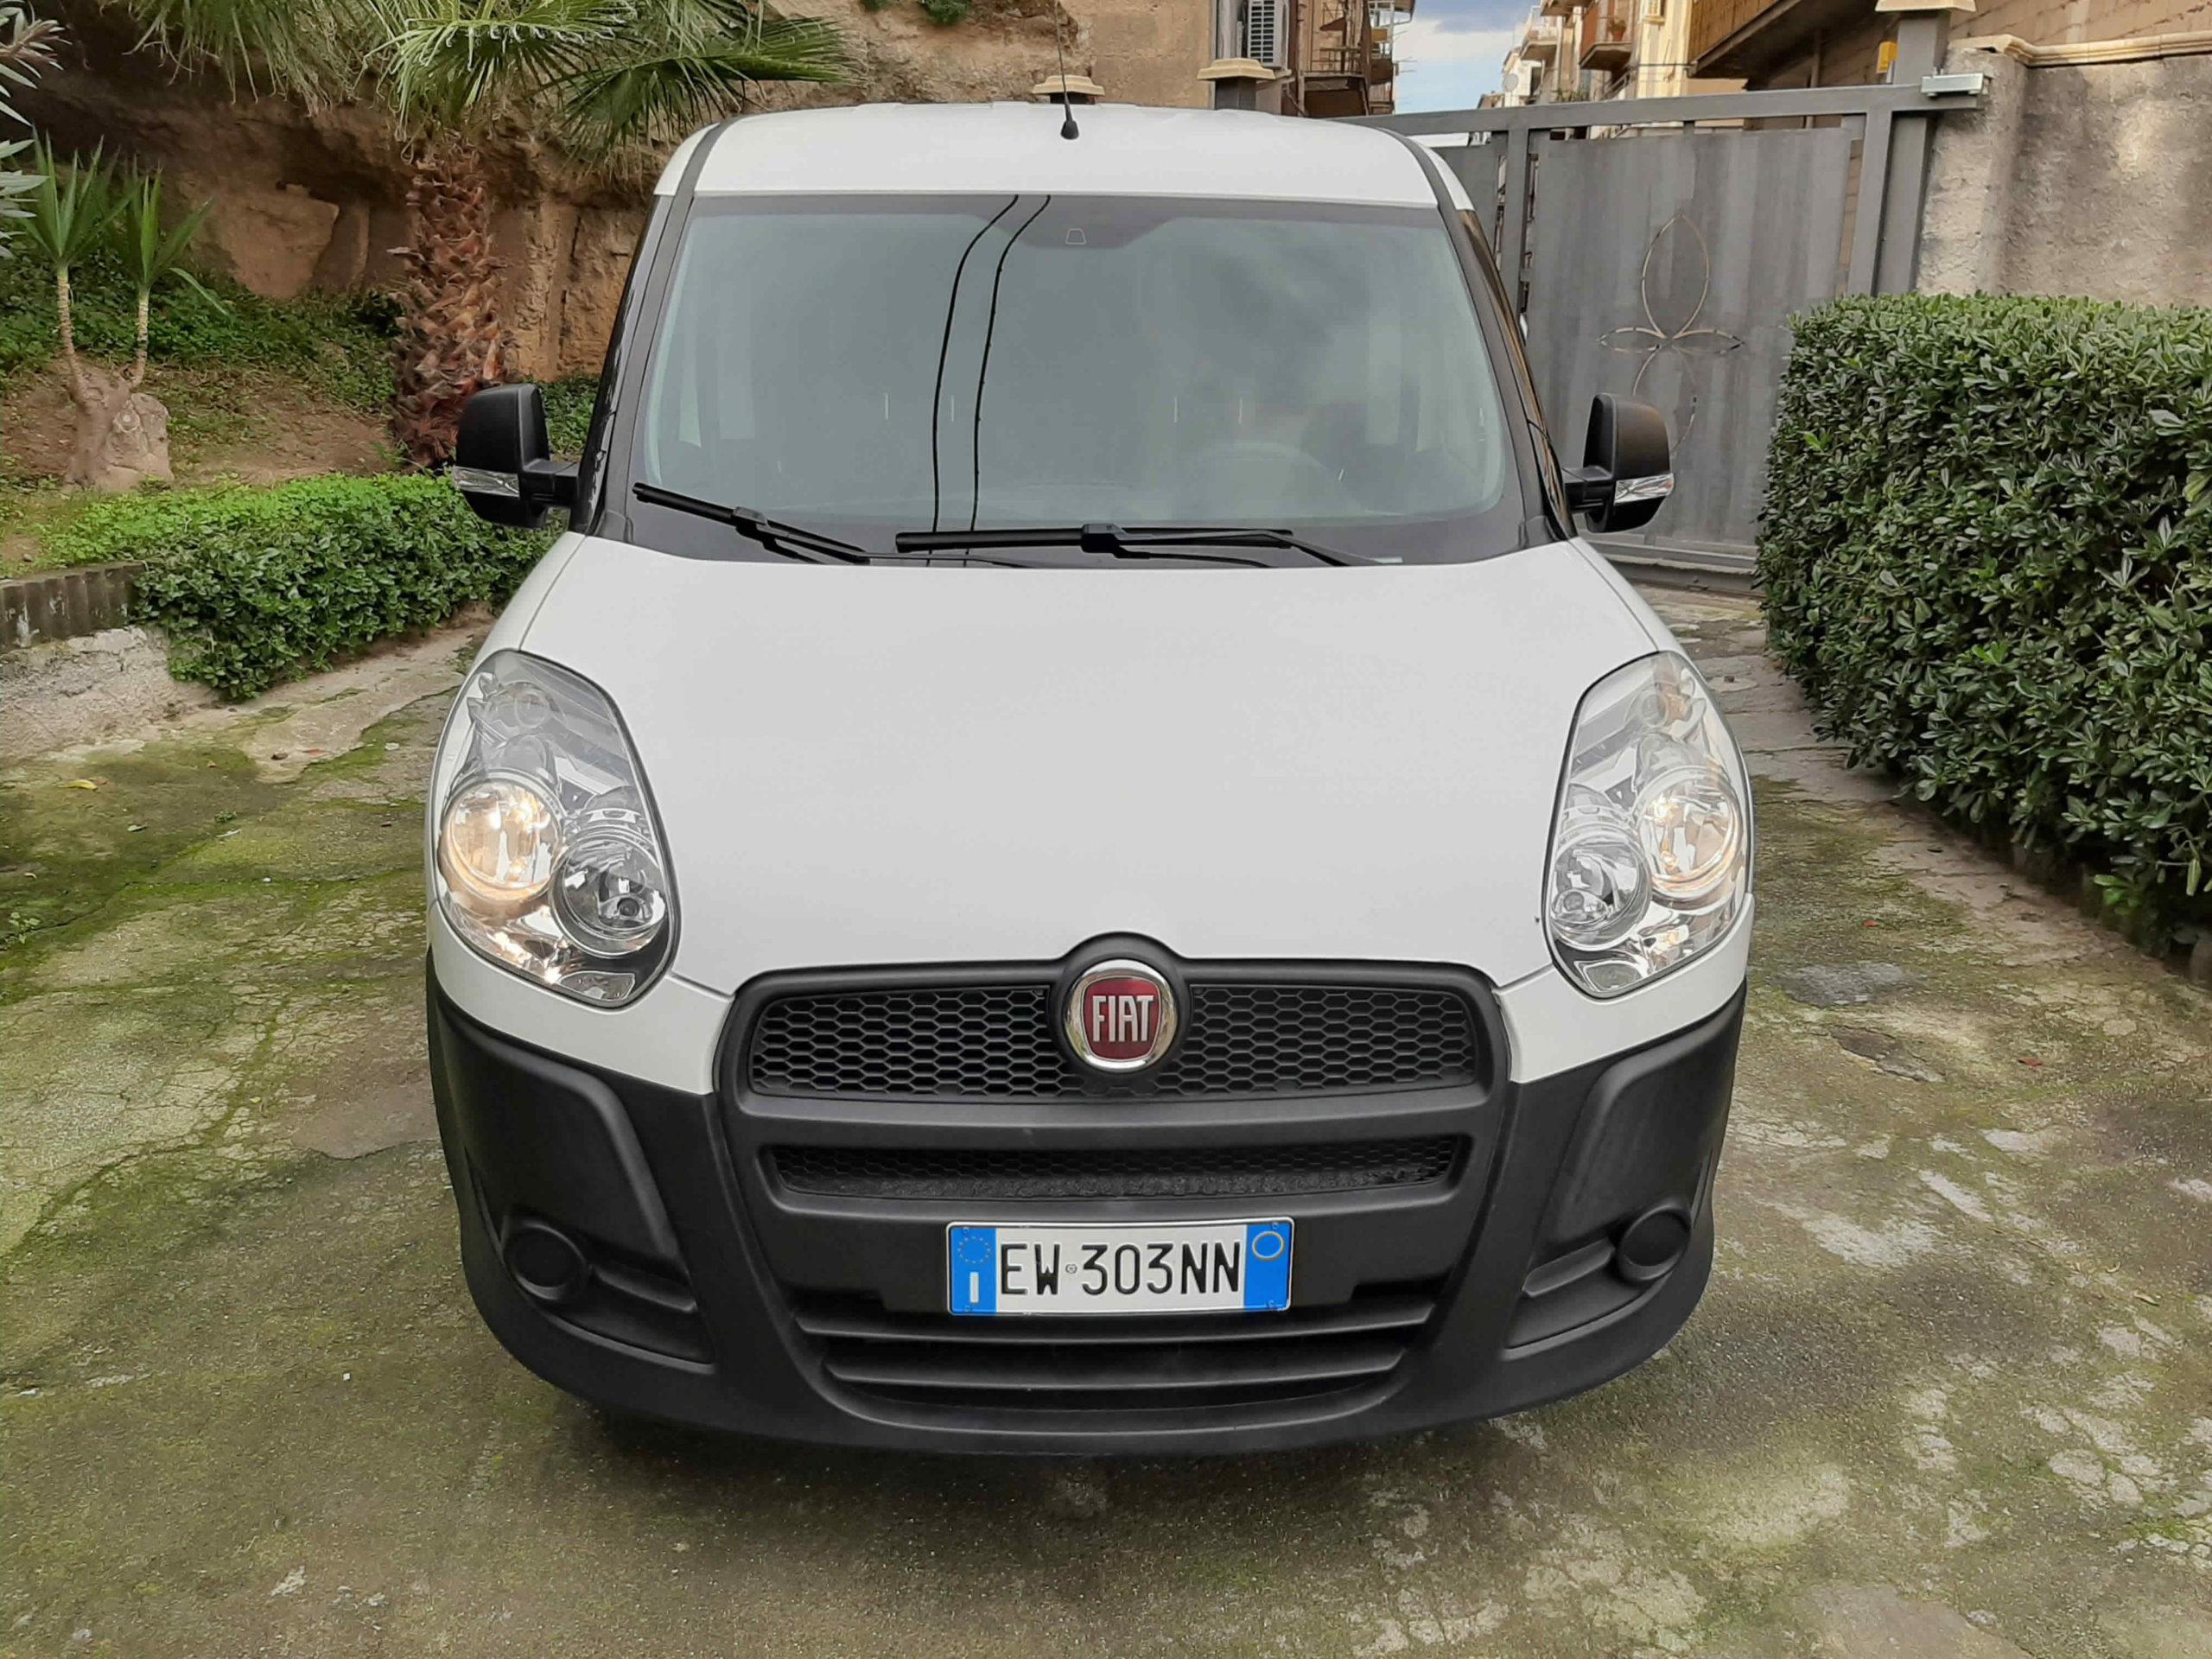 FIAT DOBLO 1.3 MJT 2014 - €6.000